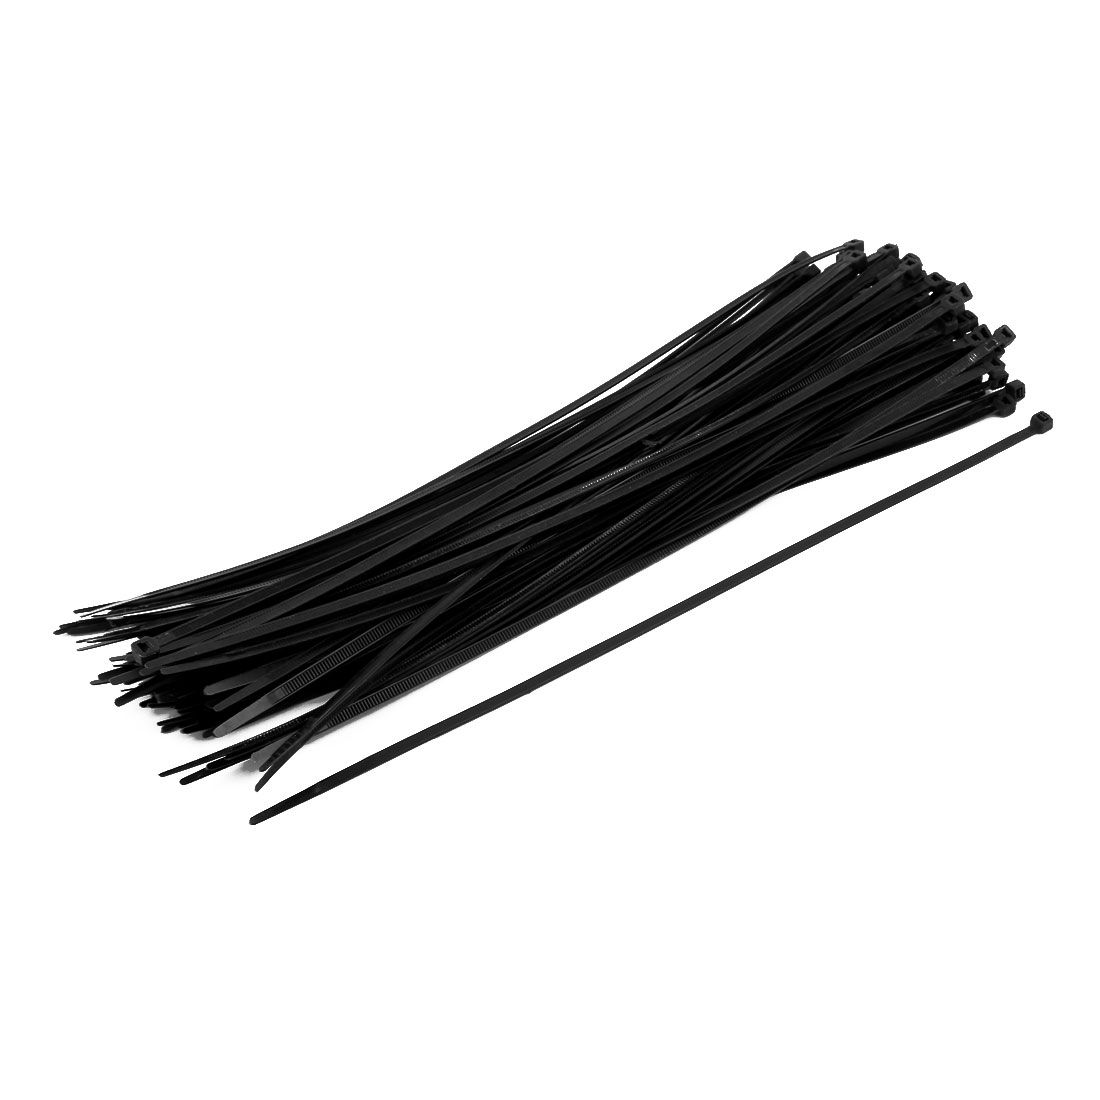 5mm x 350mm Nylon Self Locking Cable Zip Ties Fastener Black 100pcs